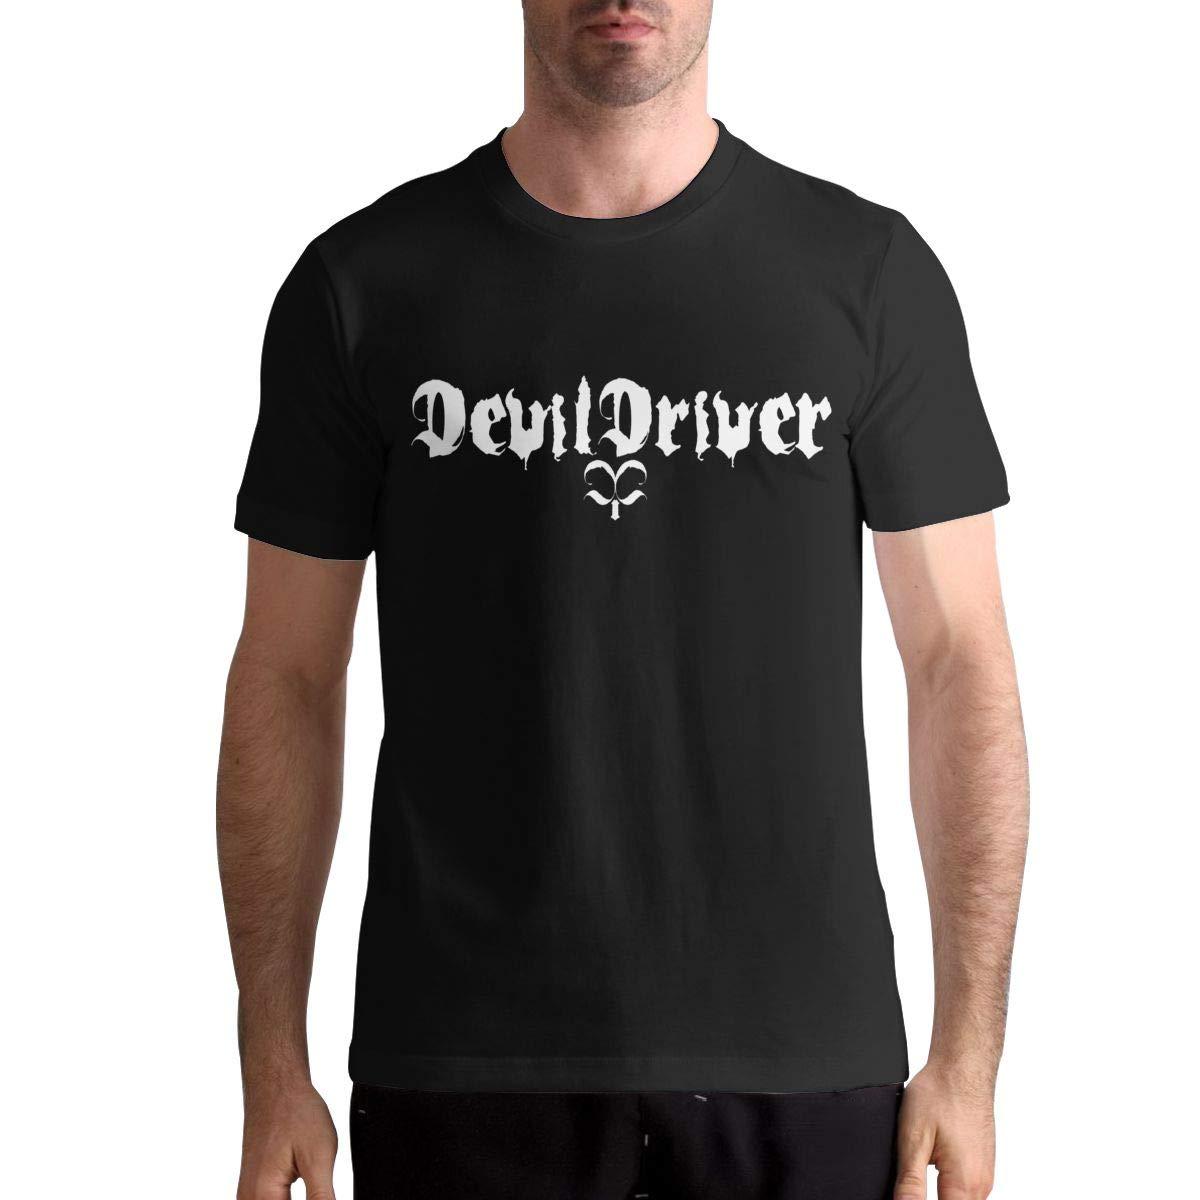 DevilDriver Shirt Men T-Shirt Casual Classic Short Sleeve Tops